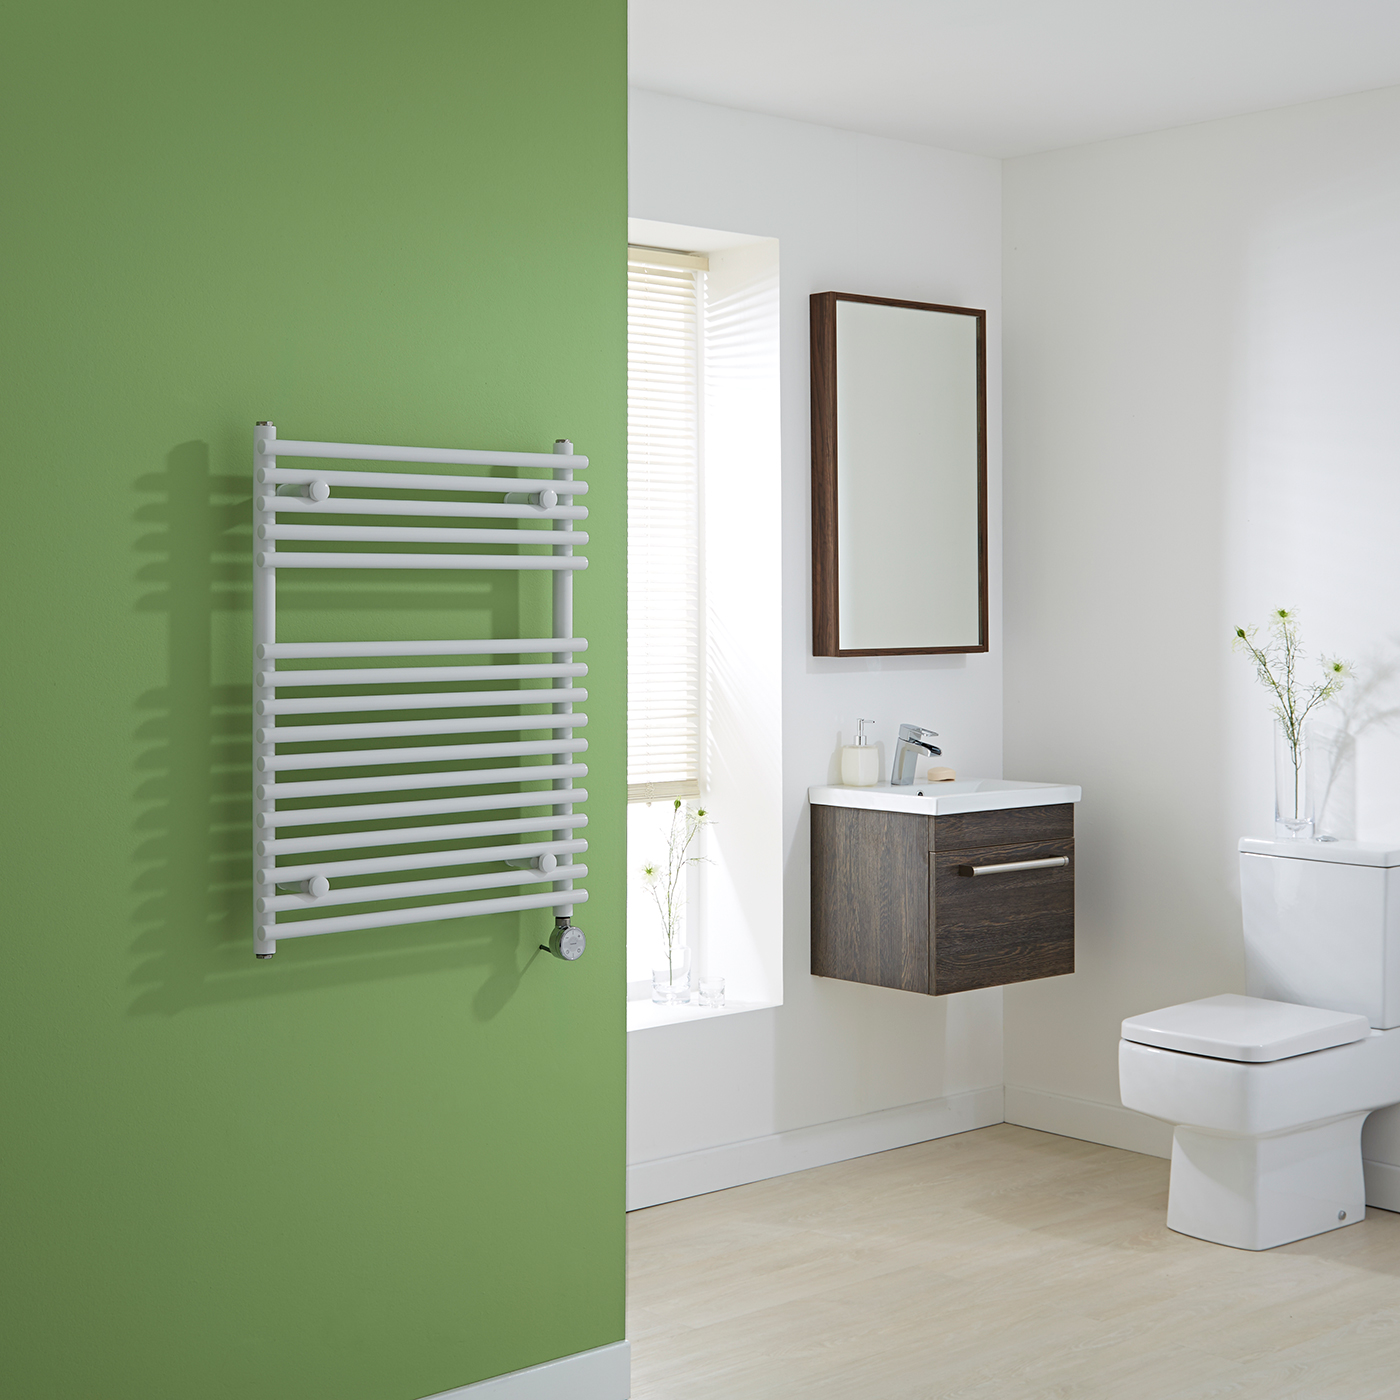 Kudox Electric - Flat White Bar on Bar Towel Rail 750mm x 600mm